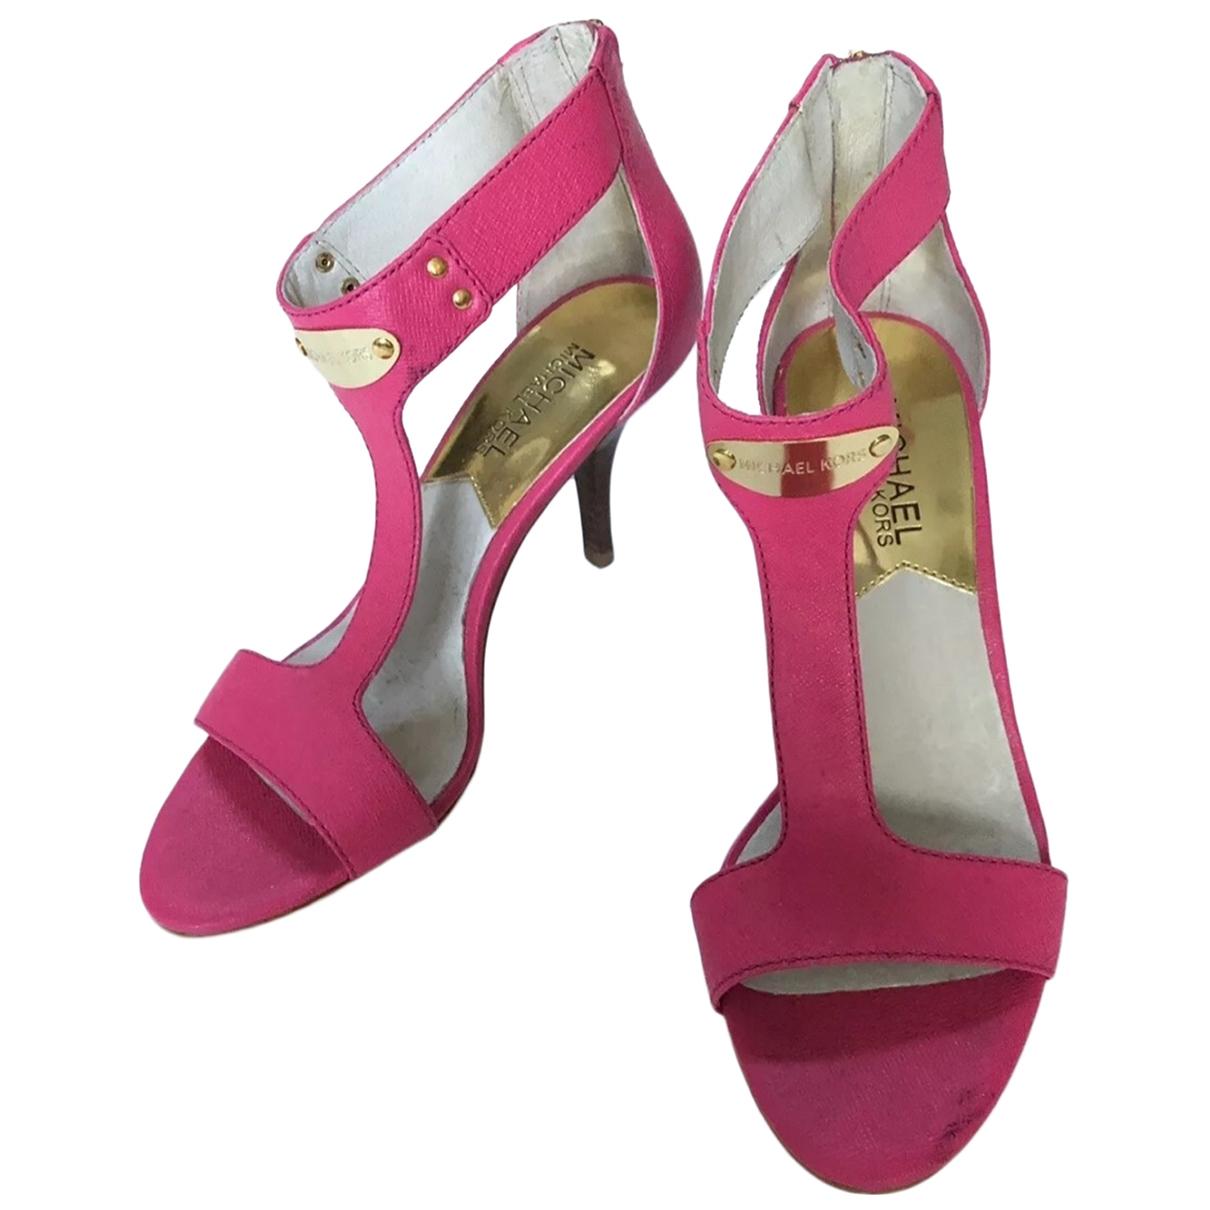 Michael Kors \N Pink Leather Heels for Women 6 US